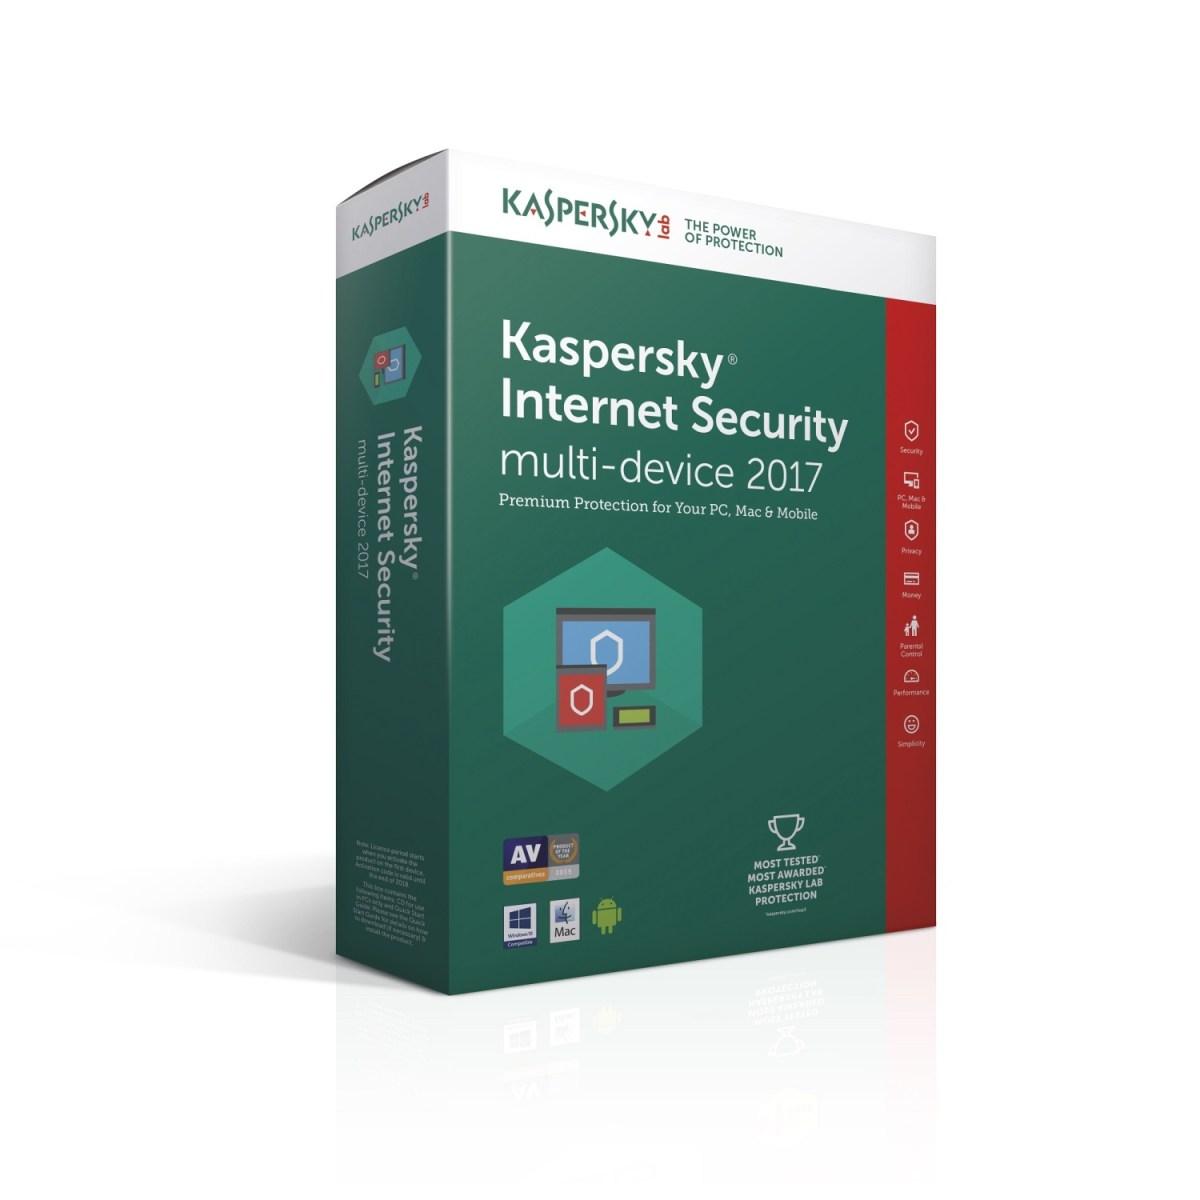 kaspersky-internet-security-multi-device-2017-1